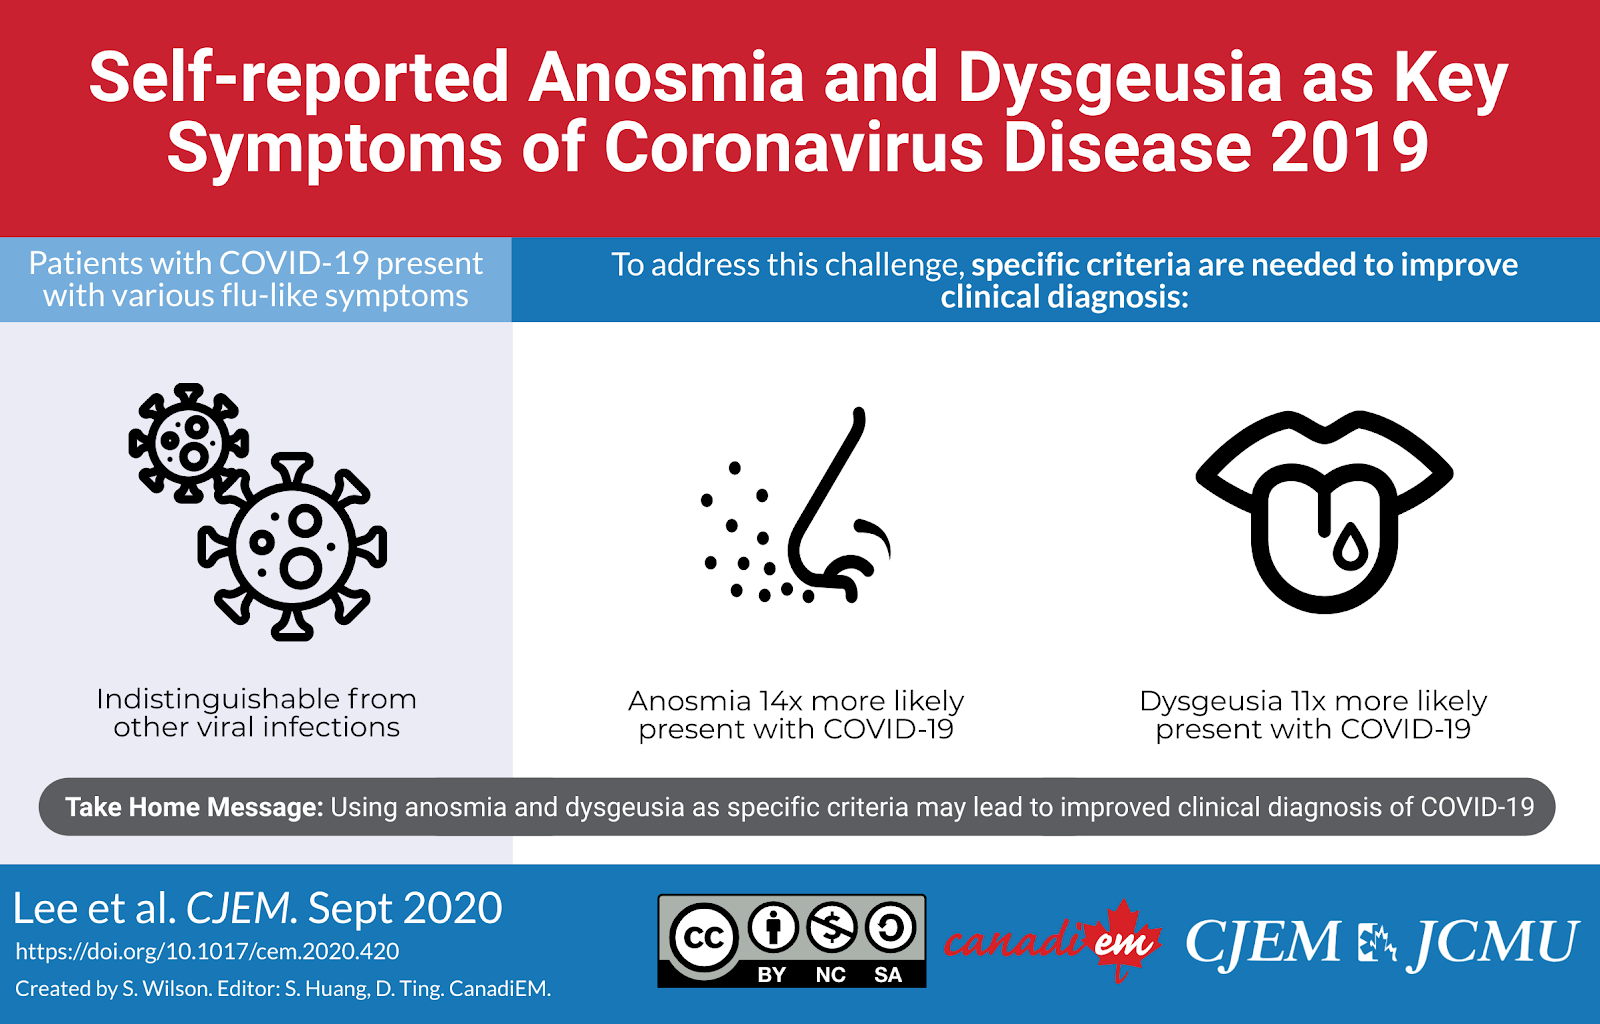 Anosmia and Dysgeusia as key symptoms of COVID-19 - CanadiEM